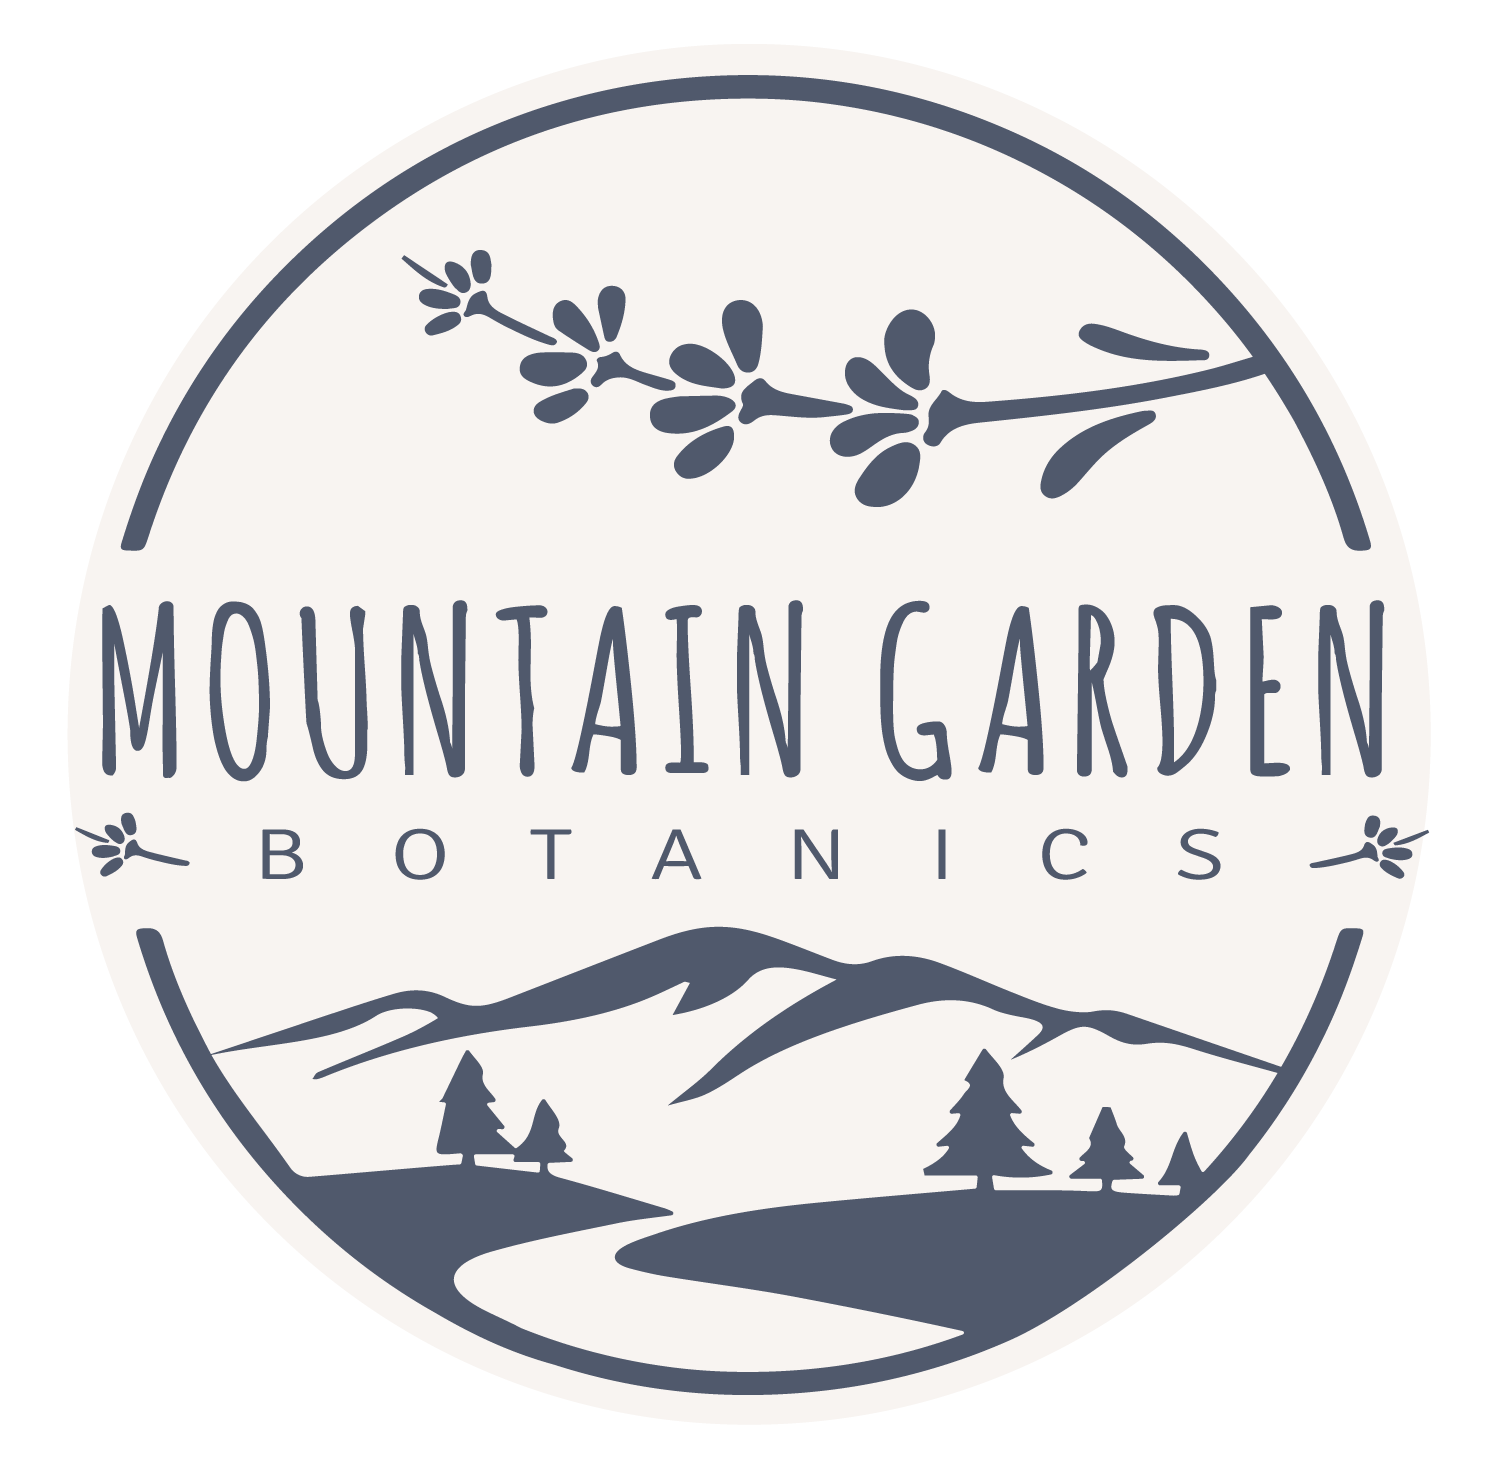 Mountain Garden Botanics